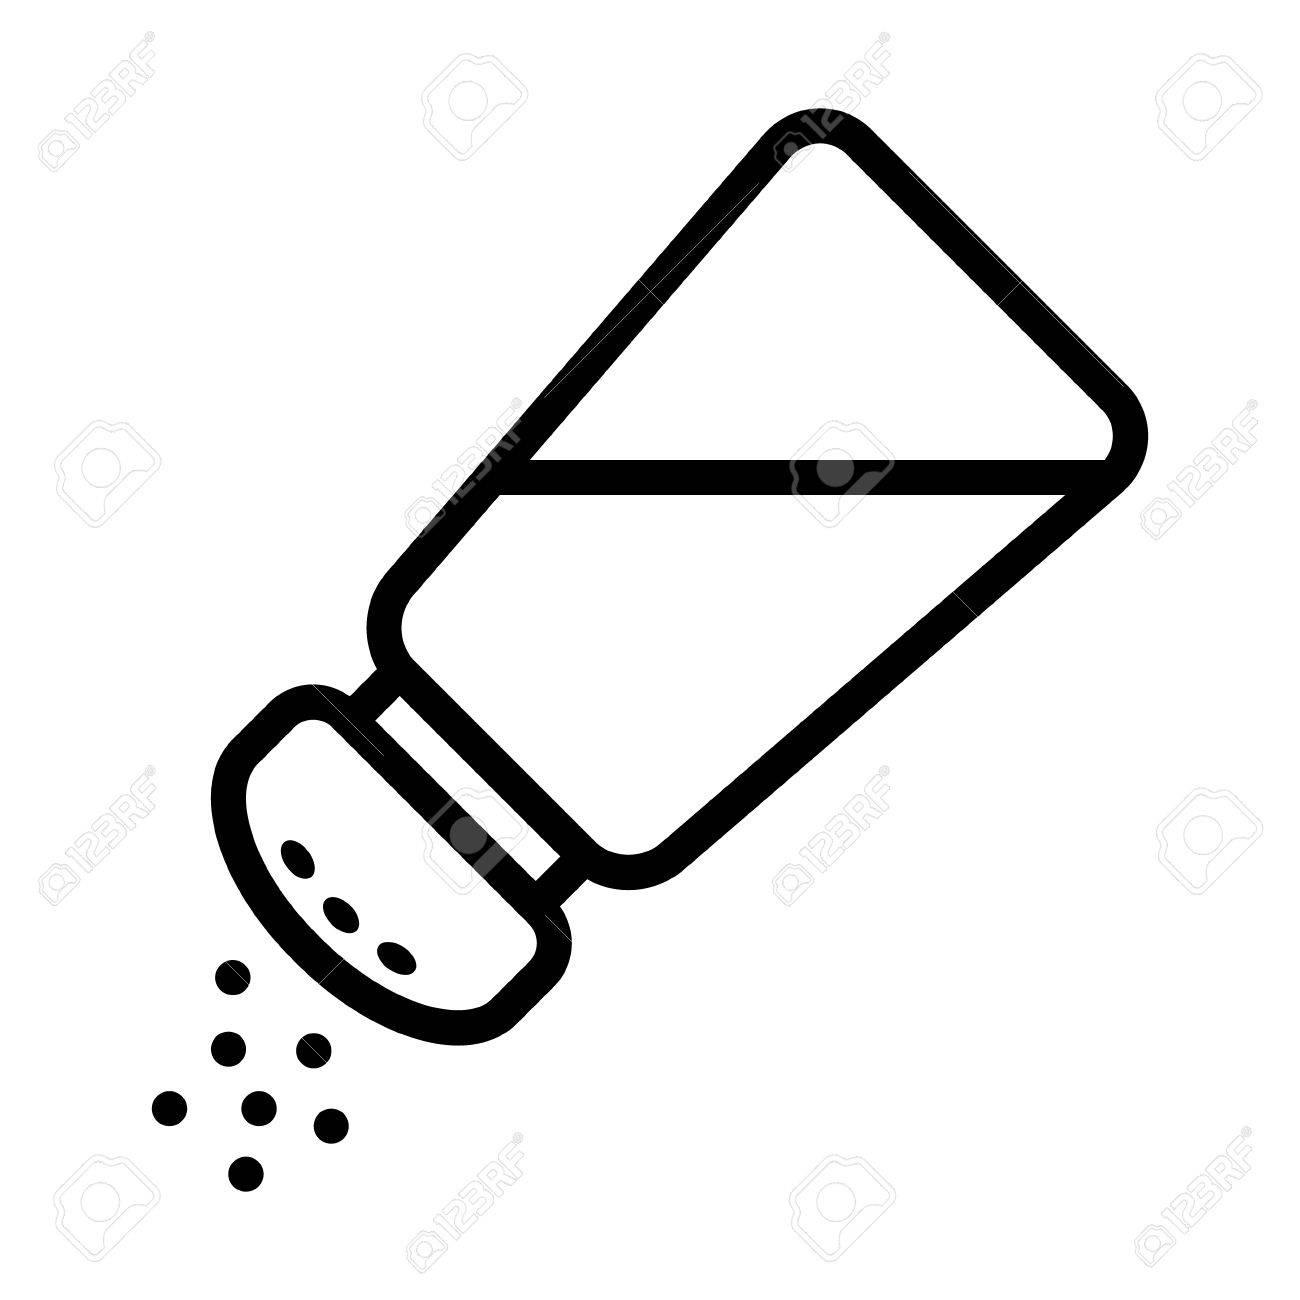 Salt shaker seasoning line icon for food apps and websites - 50762926